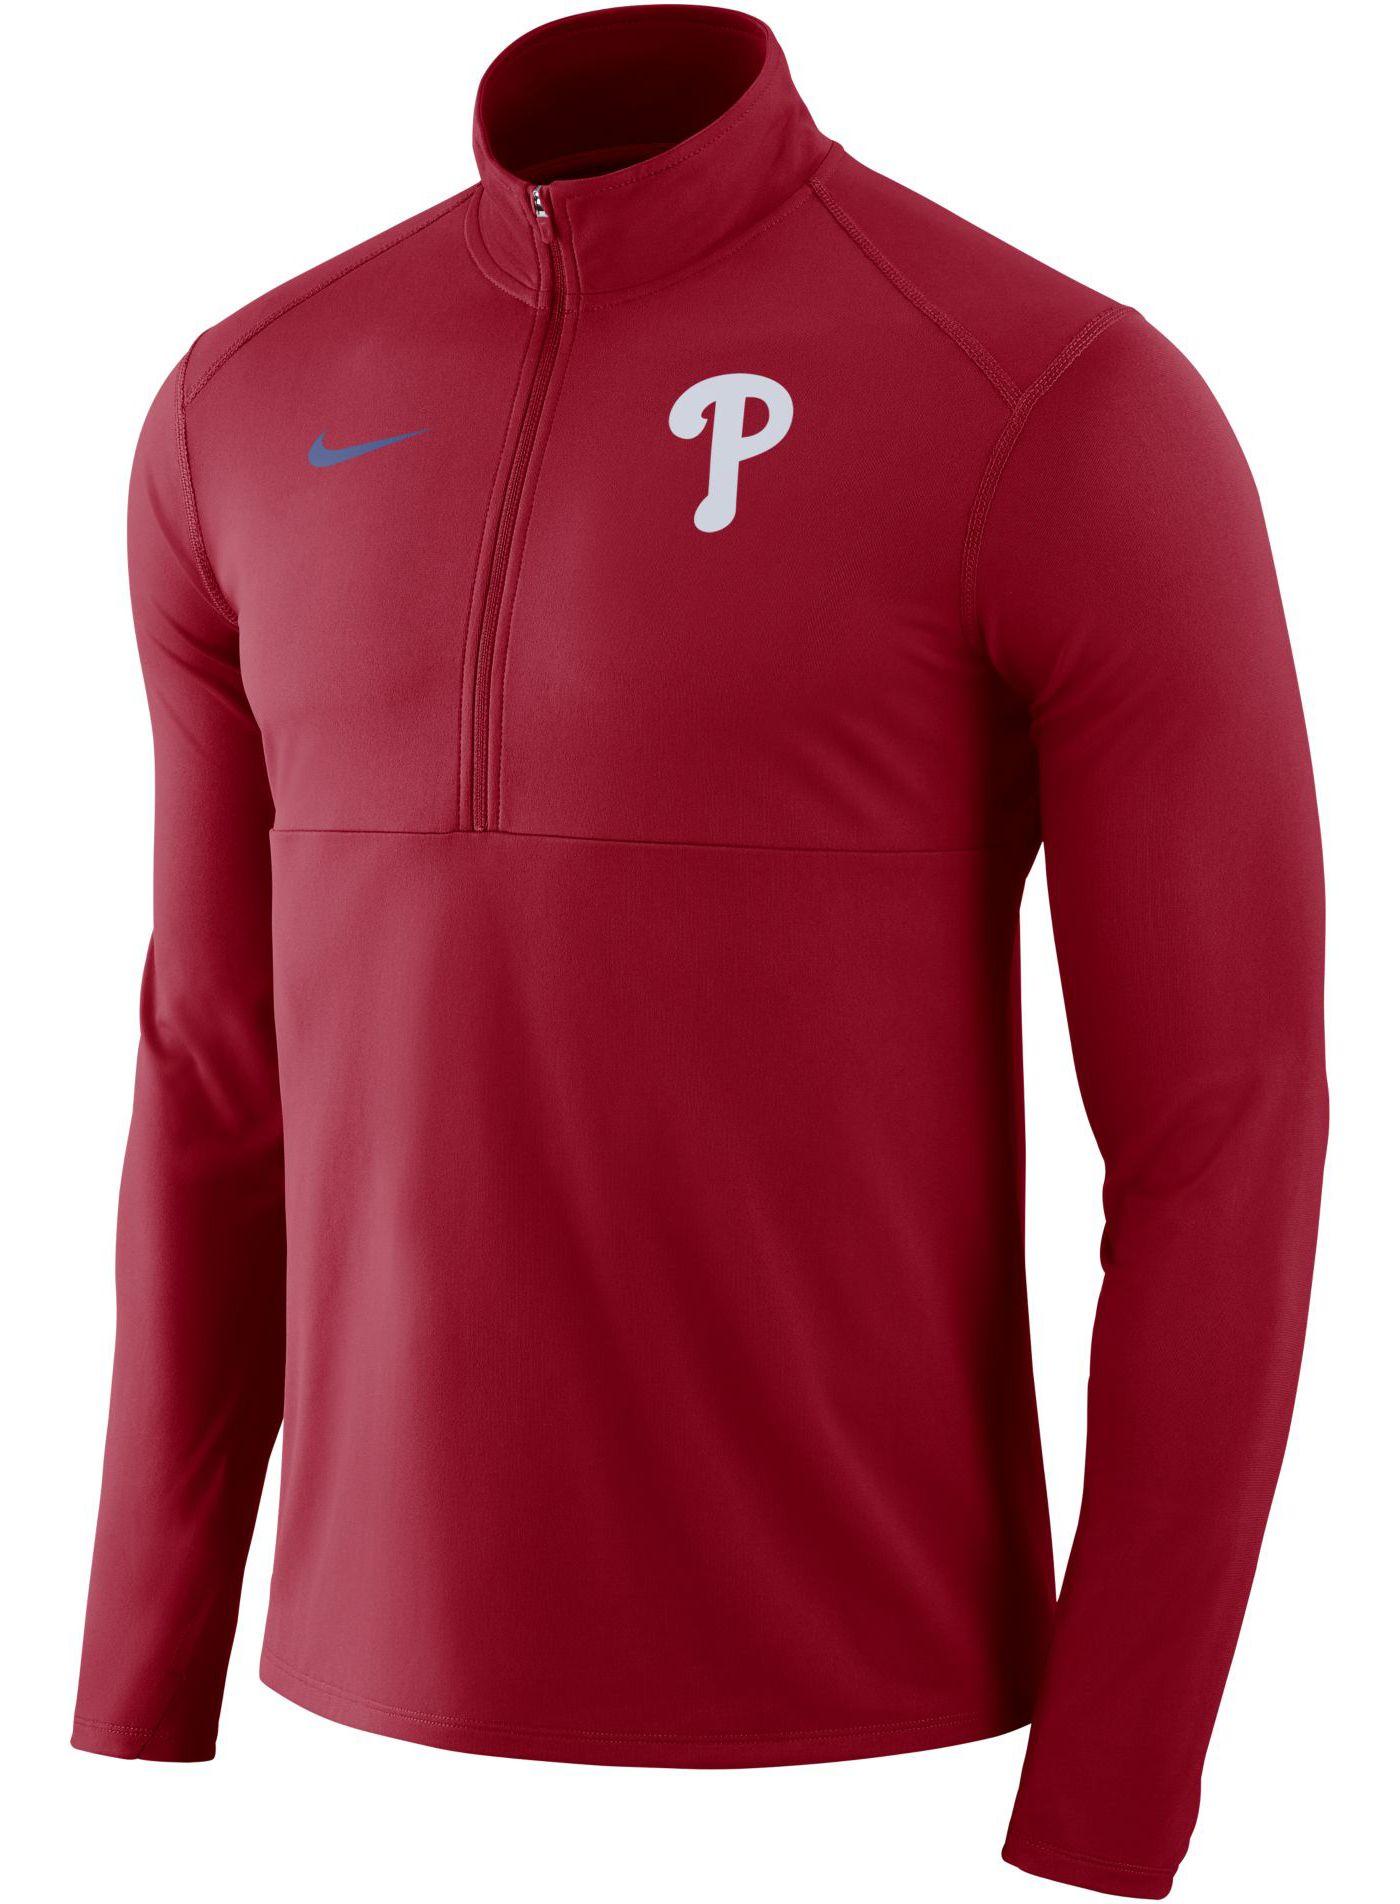 Nike Men's Philadelphia Phillies Dri-FIT Element Half-Zip Jacket